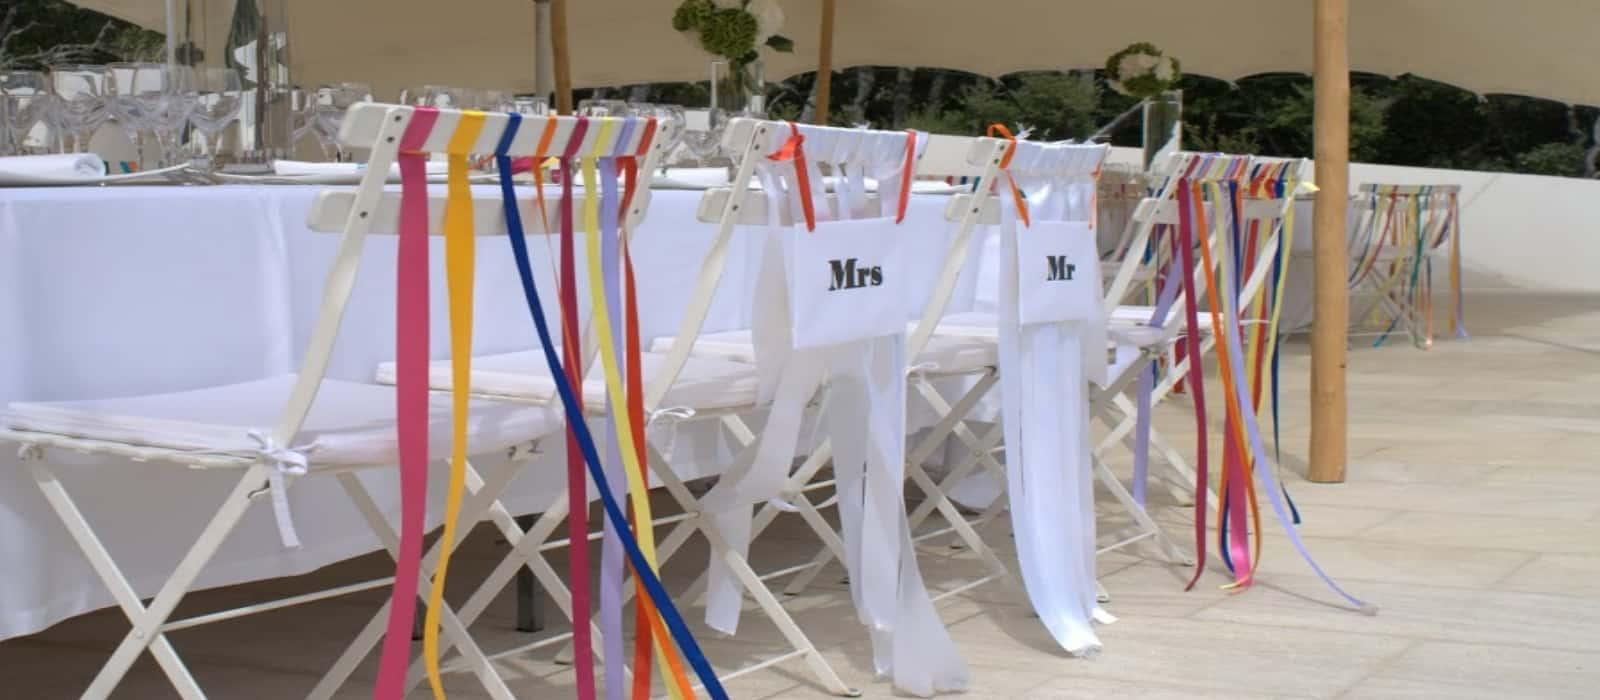 Reams of Ribbon – wedding decorations